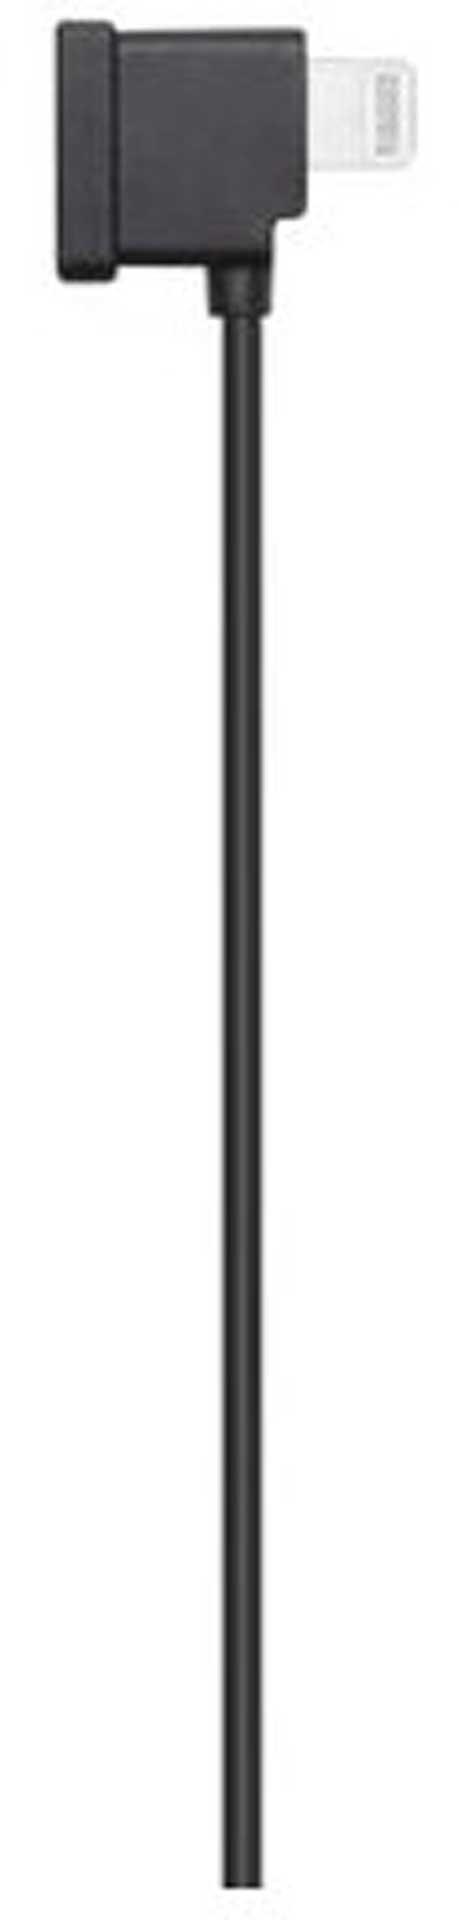 DJI MAVIC AIR 2 RC CABLE LIGHTNING CONNECTOR